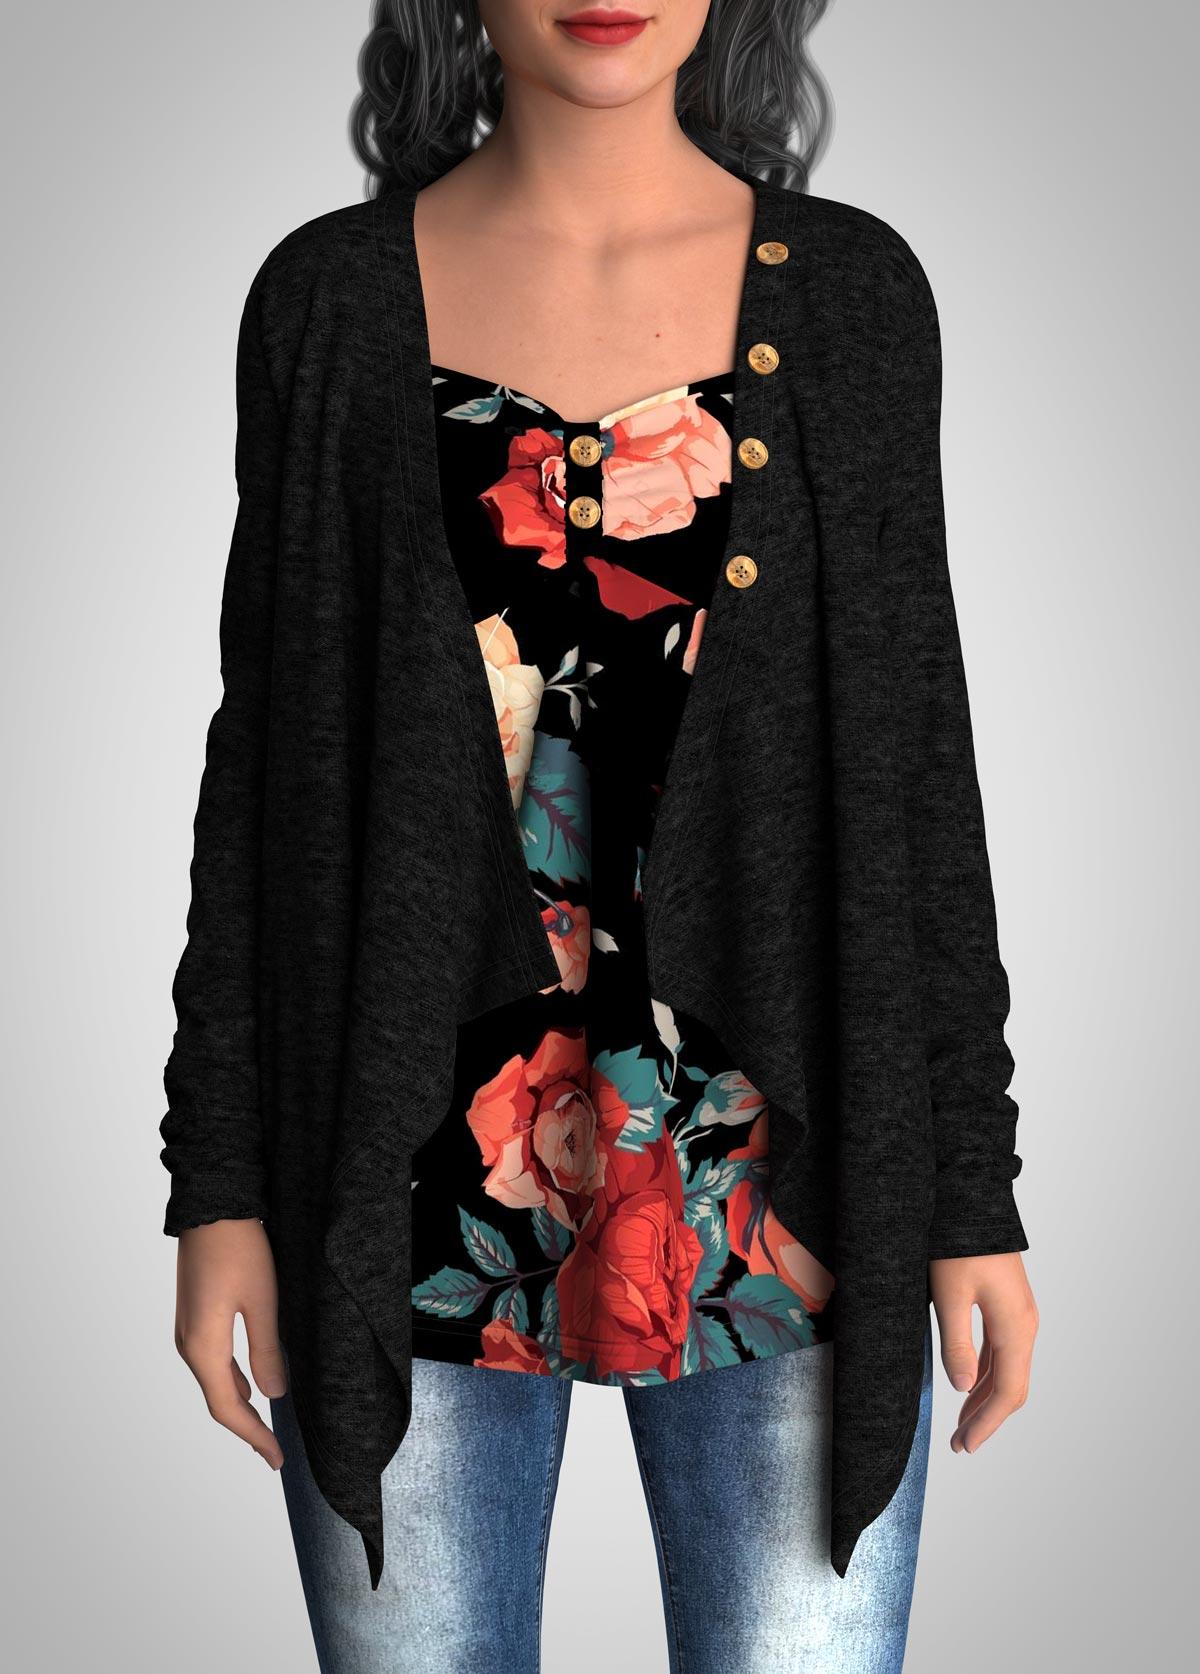 ROTITA Floral Print Faux Two Piece Button Tunic Top